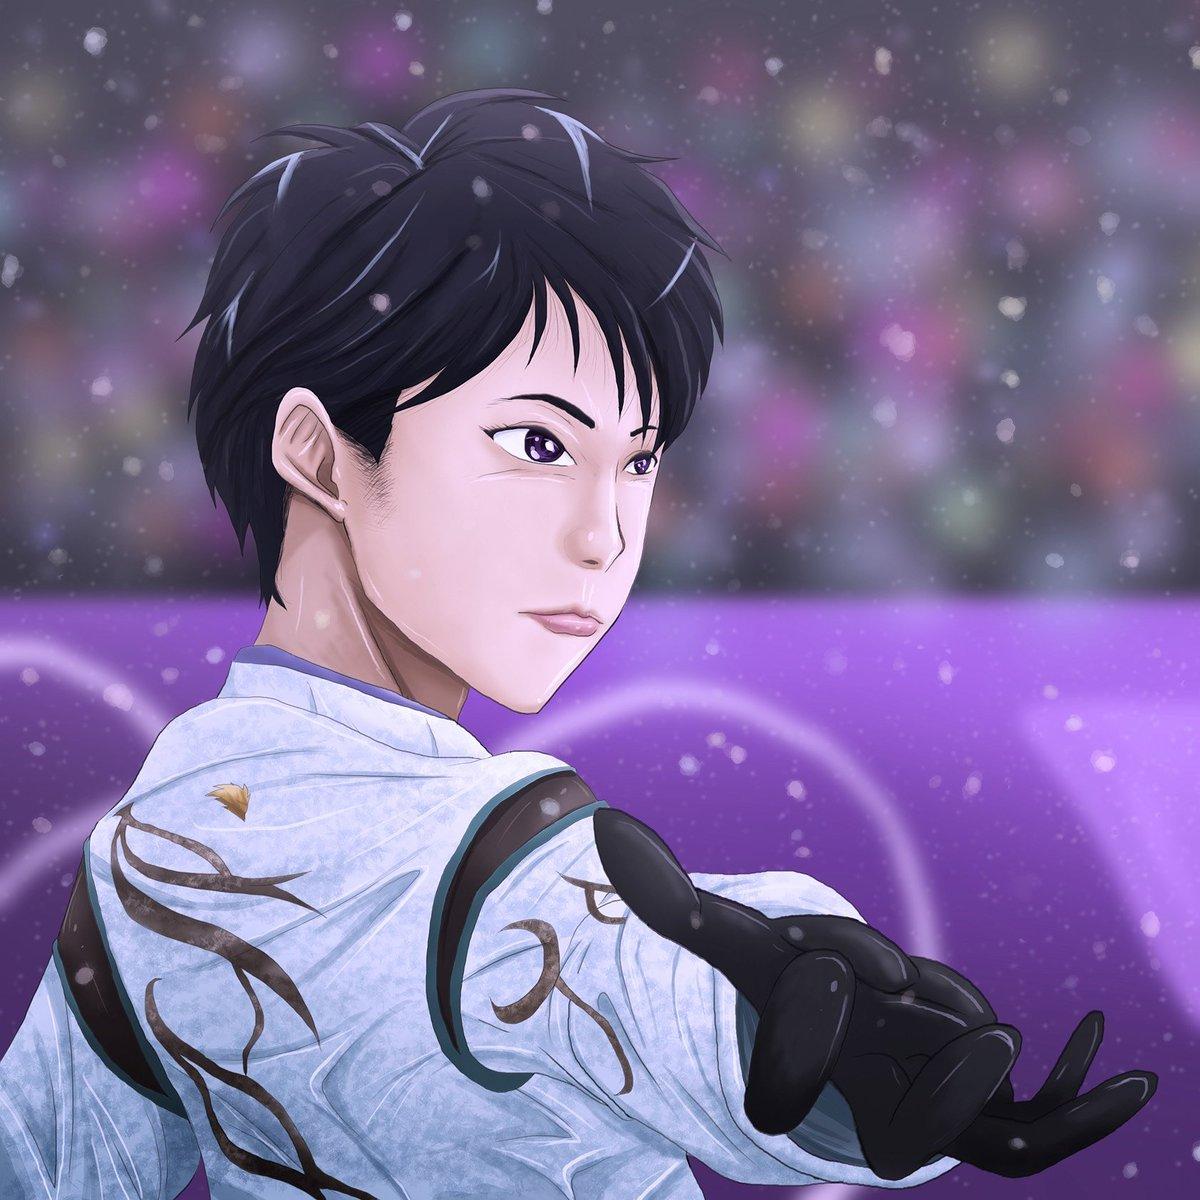 Masami Rubato On Twitter こんばんは 羽生選手金メダルとりまし